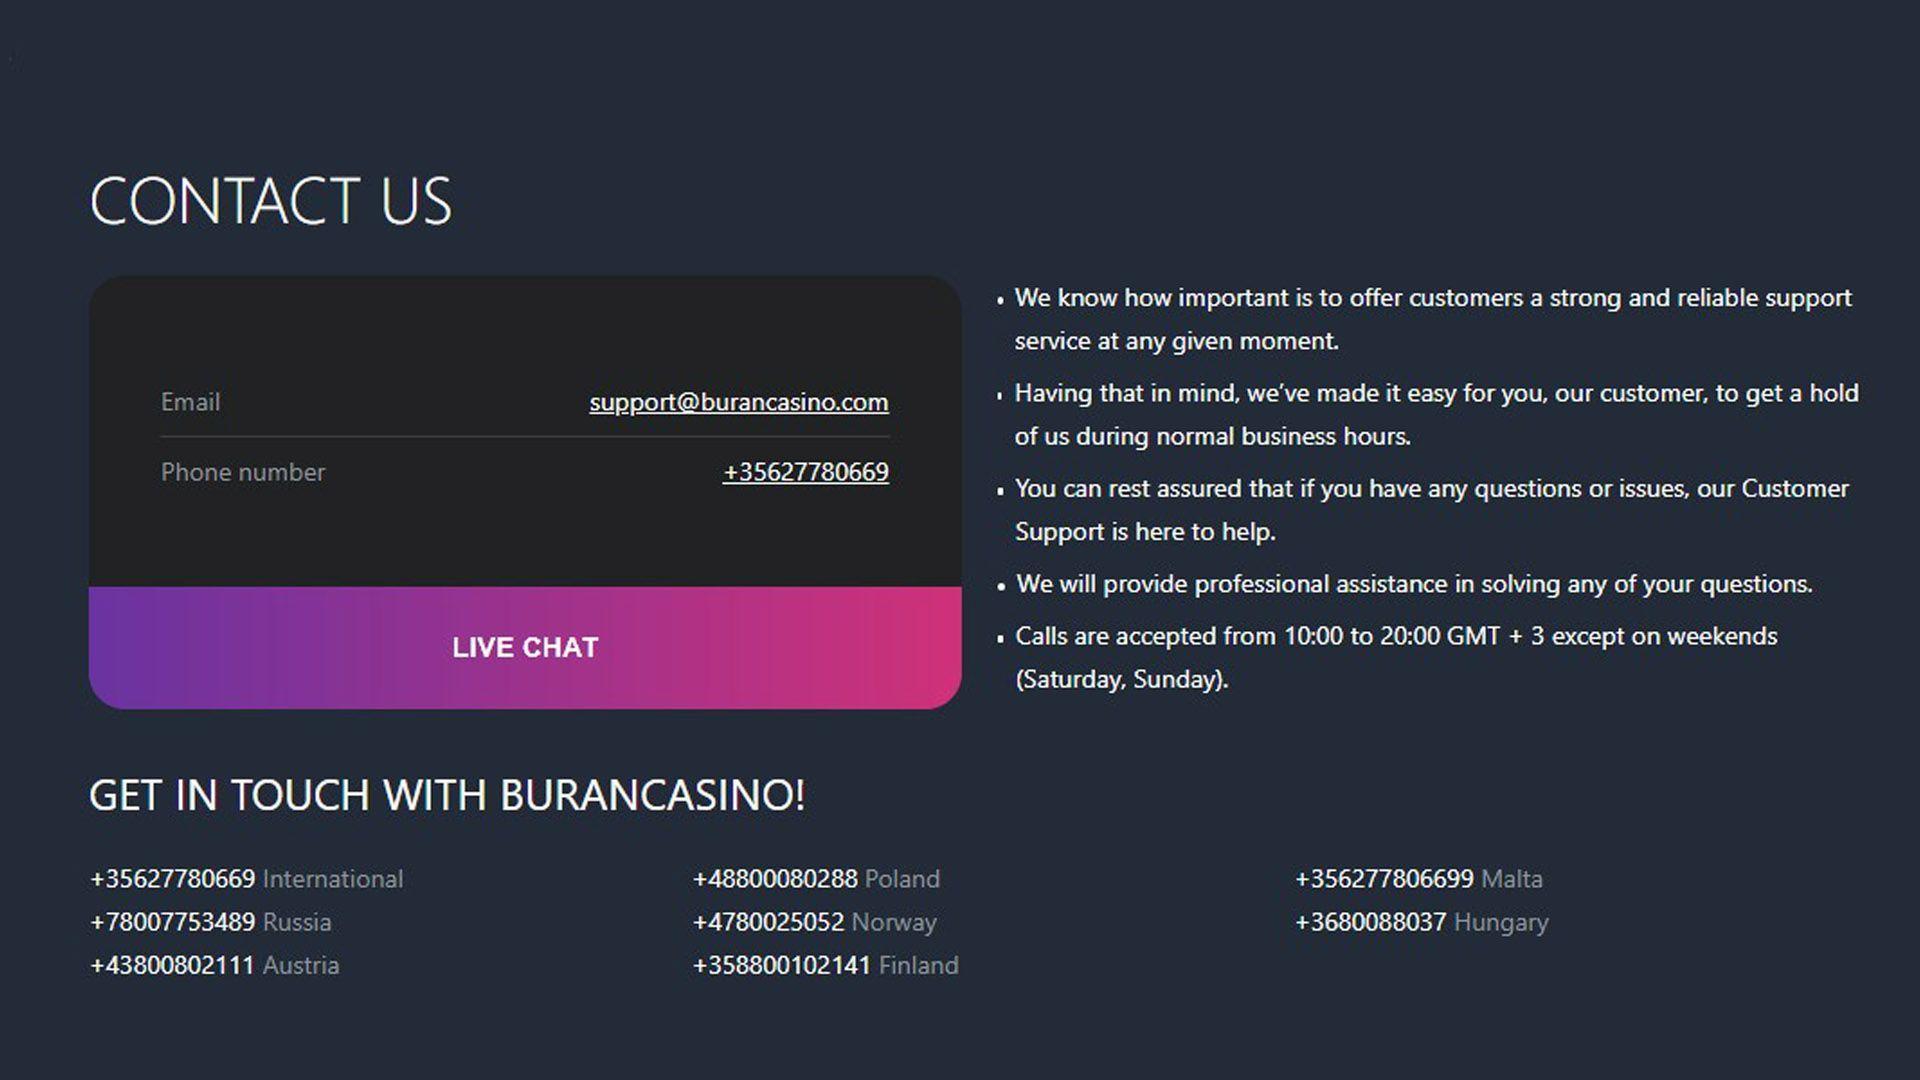 Buran Casino Contacts Page Shot